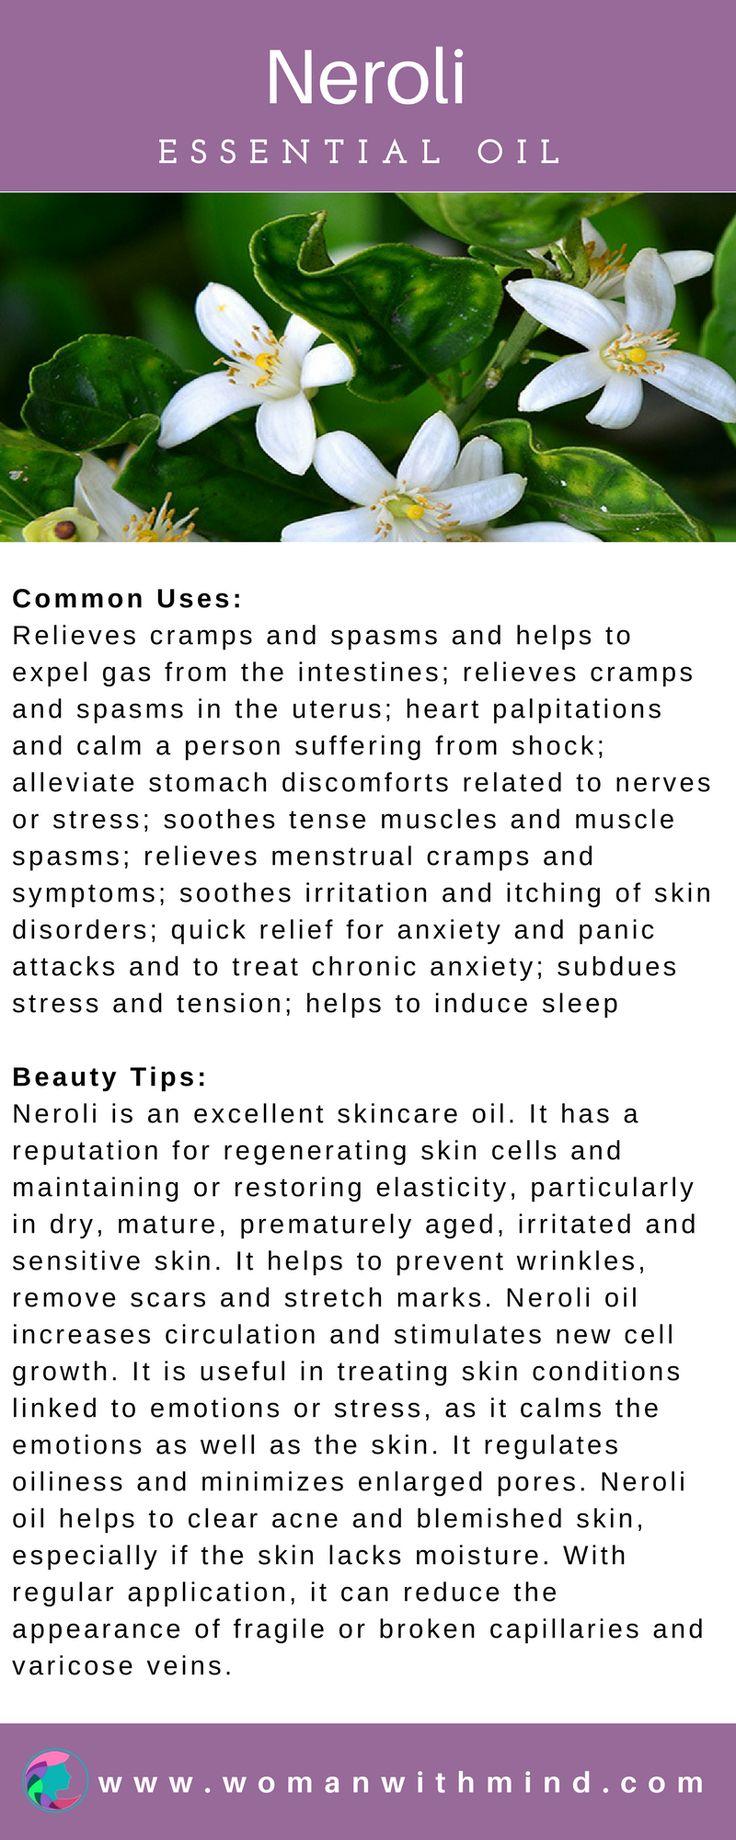 Neroli Essential Oil Guide & Application #essentialoils #diybeauty